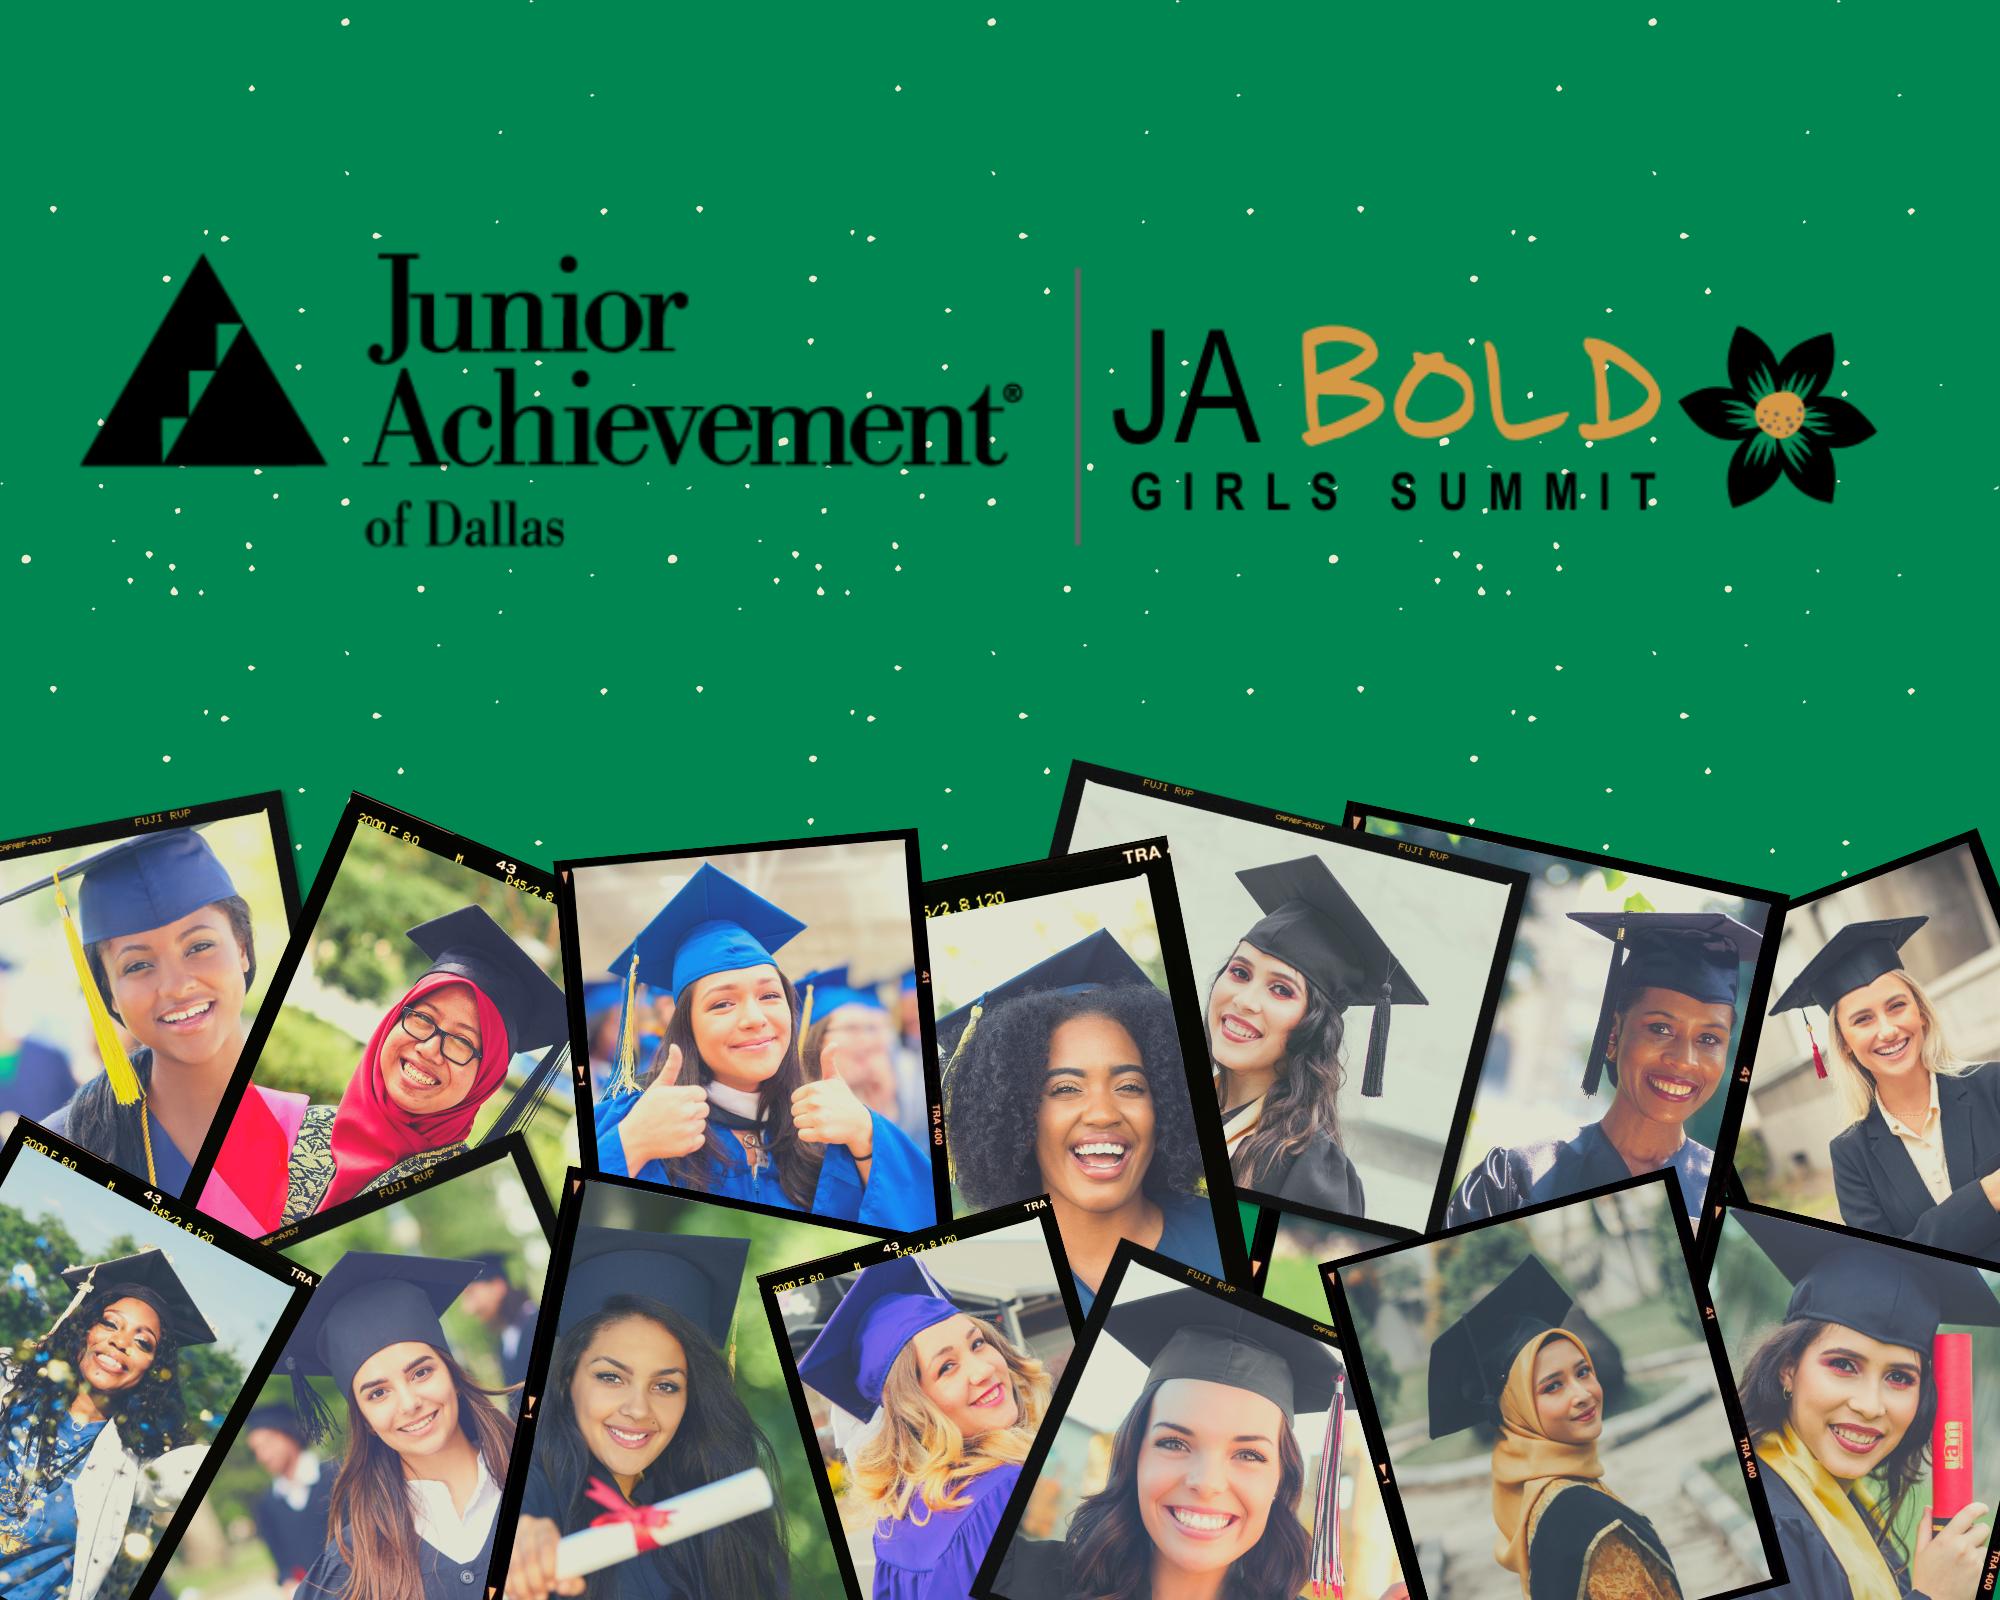 JA BOLD Student Pics